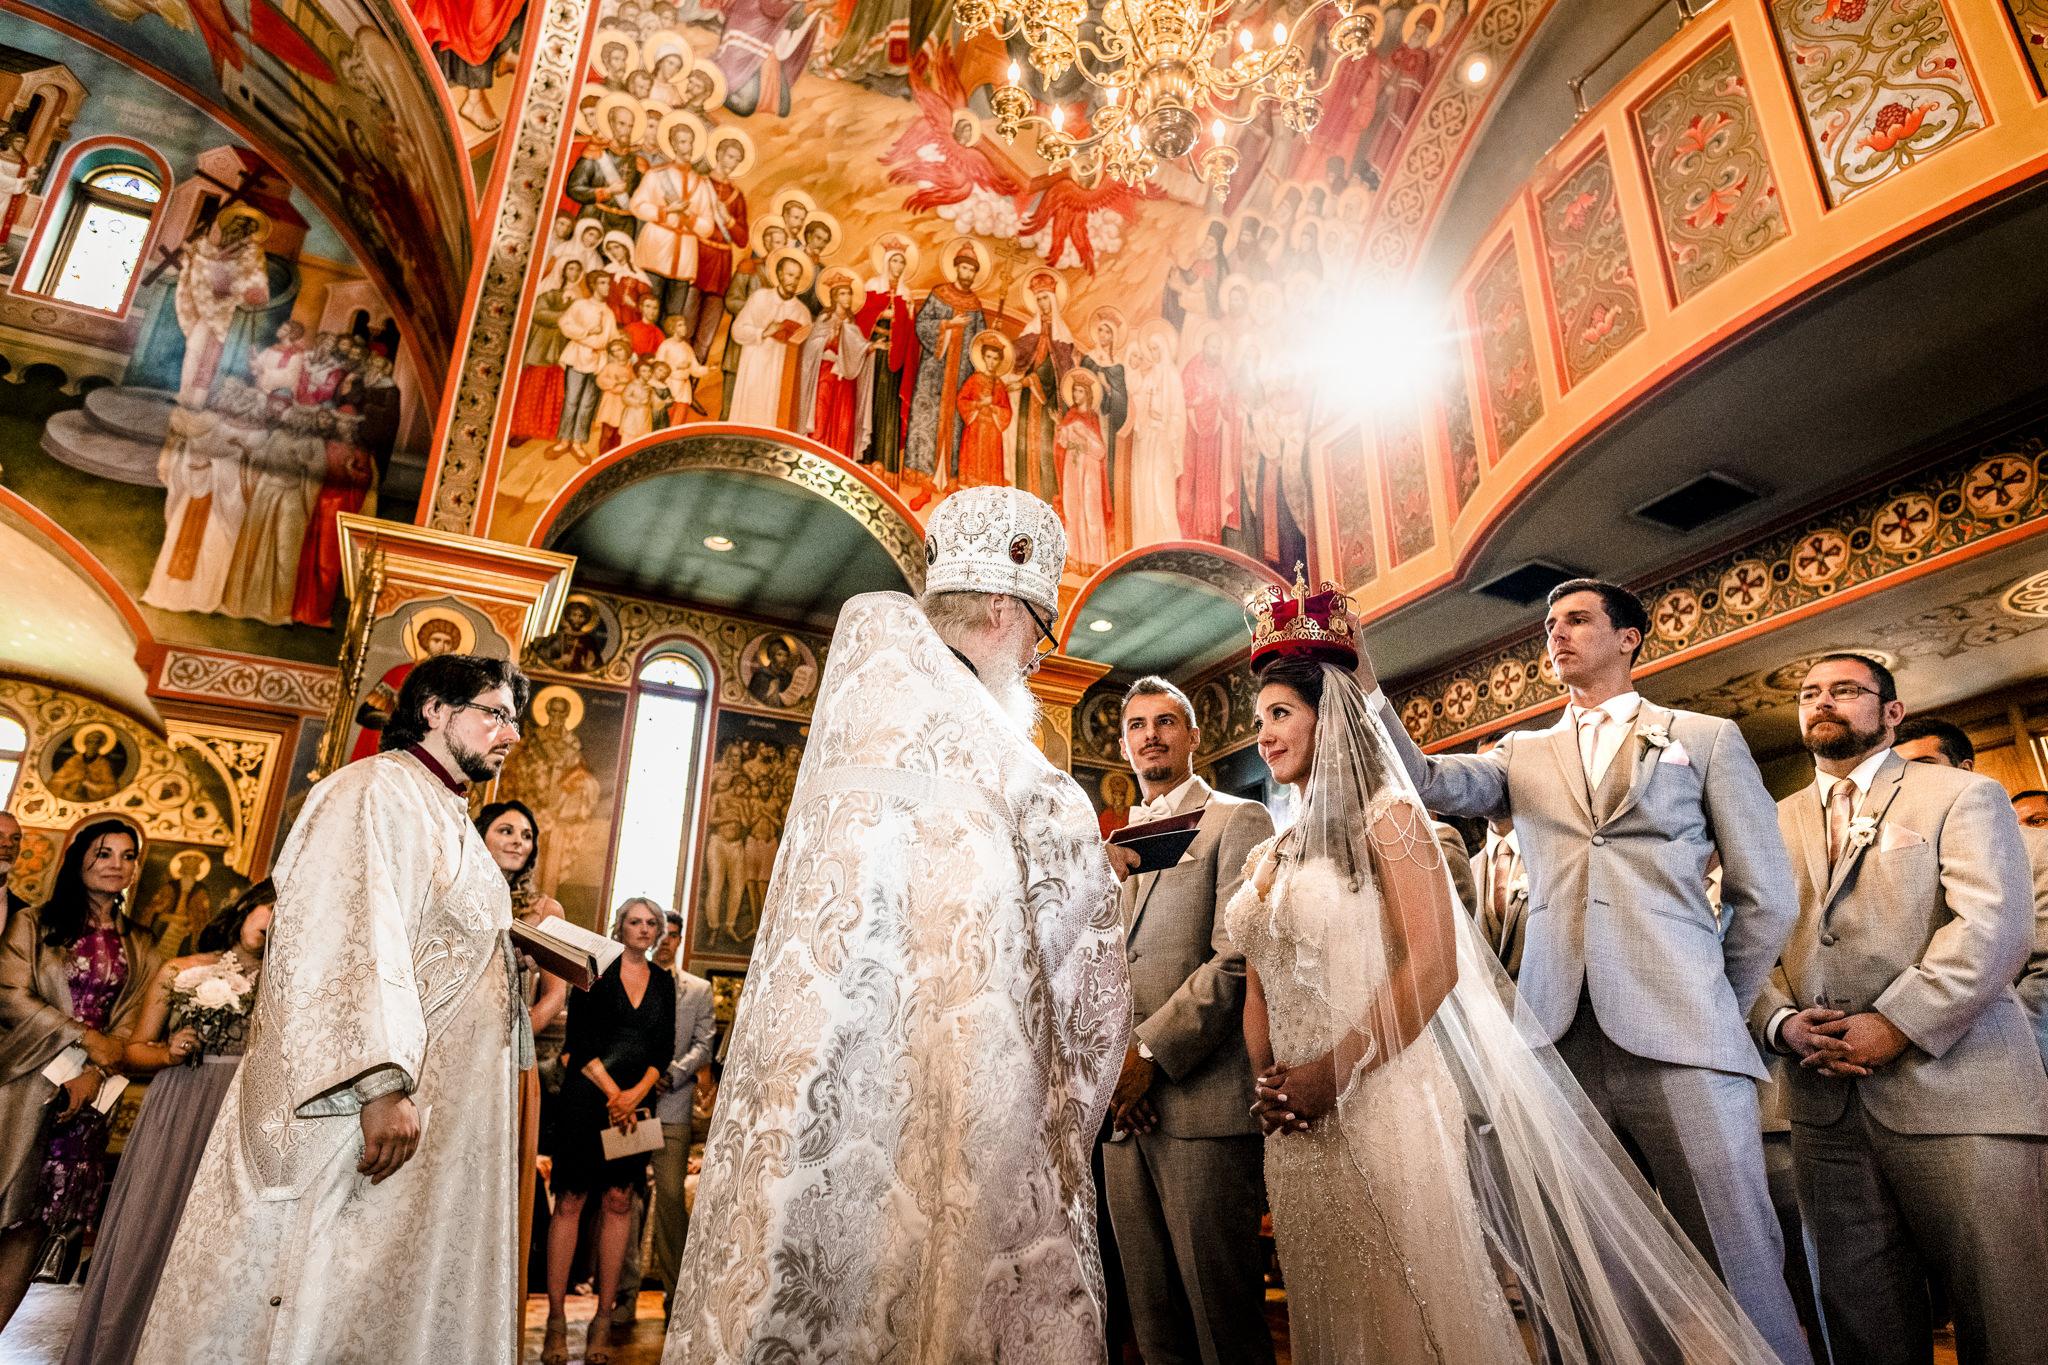 Barbato-Moorestown-Community-House-Wedding-New-Jersey-Photographer-13.JPG